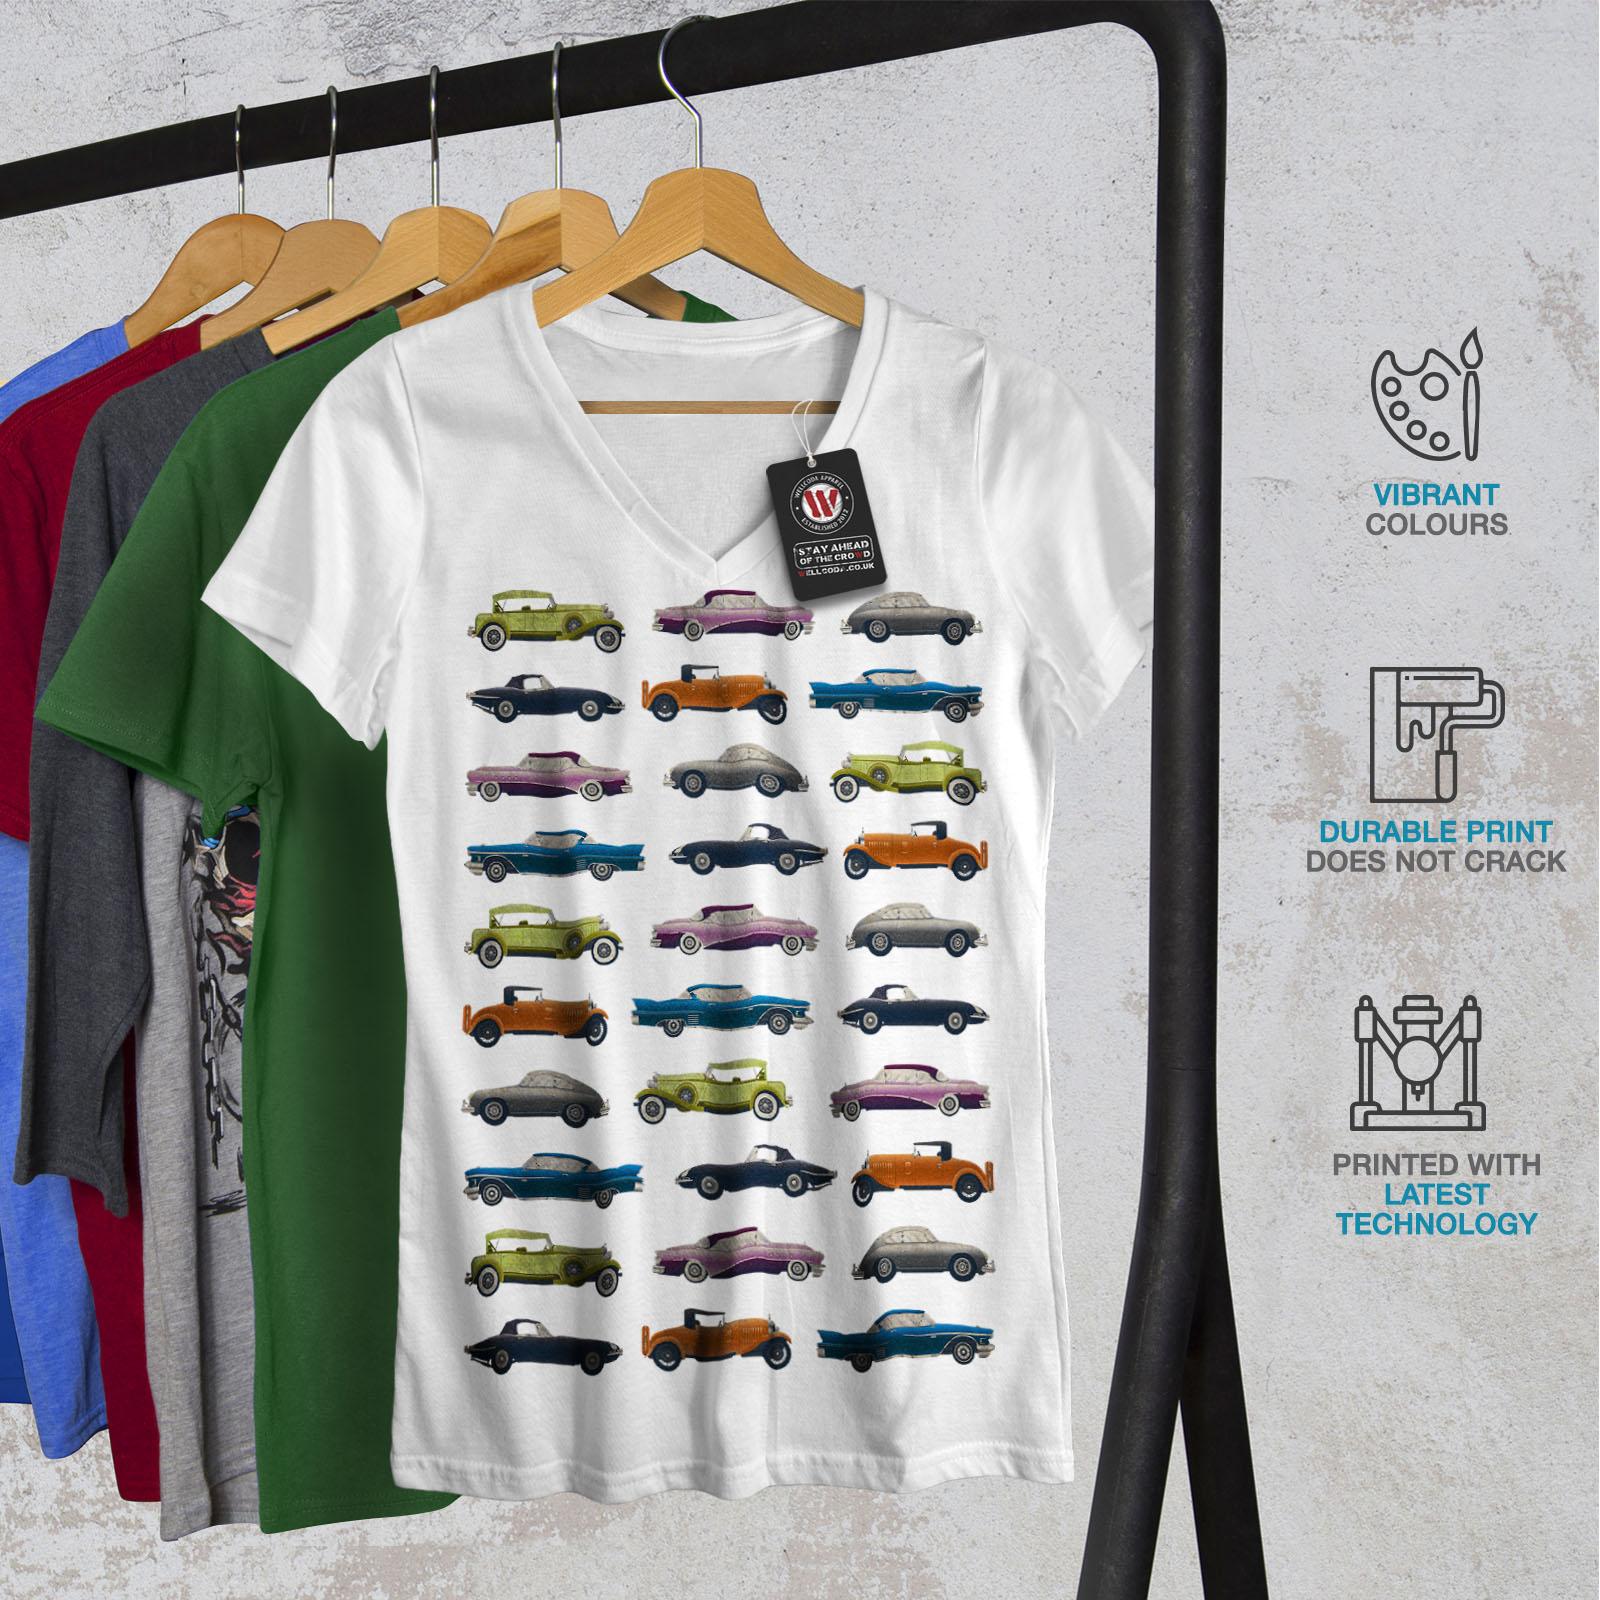 Wellcoda-Classic-Old-Pattern-Car-Womens-V-Neck-T-shirt-Retro-Graphic-Design-Tee thumbnail 8